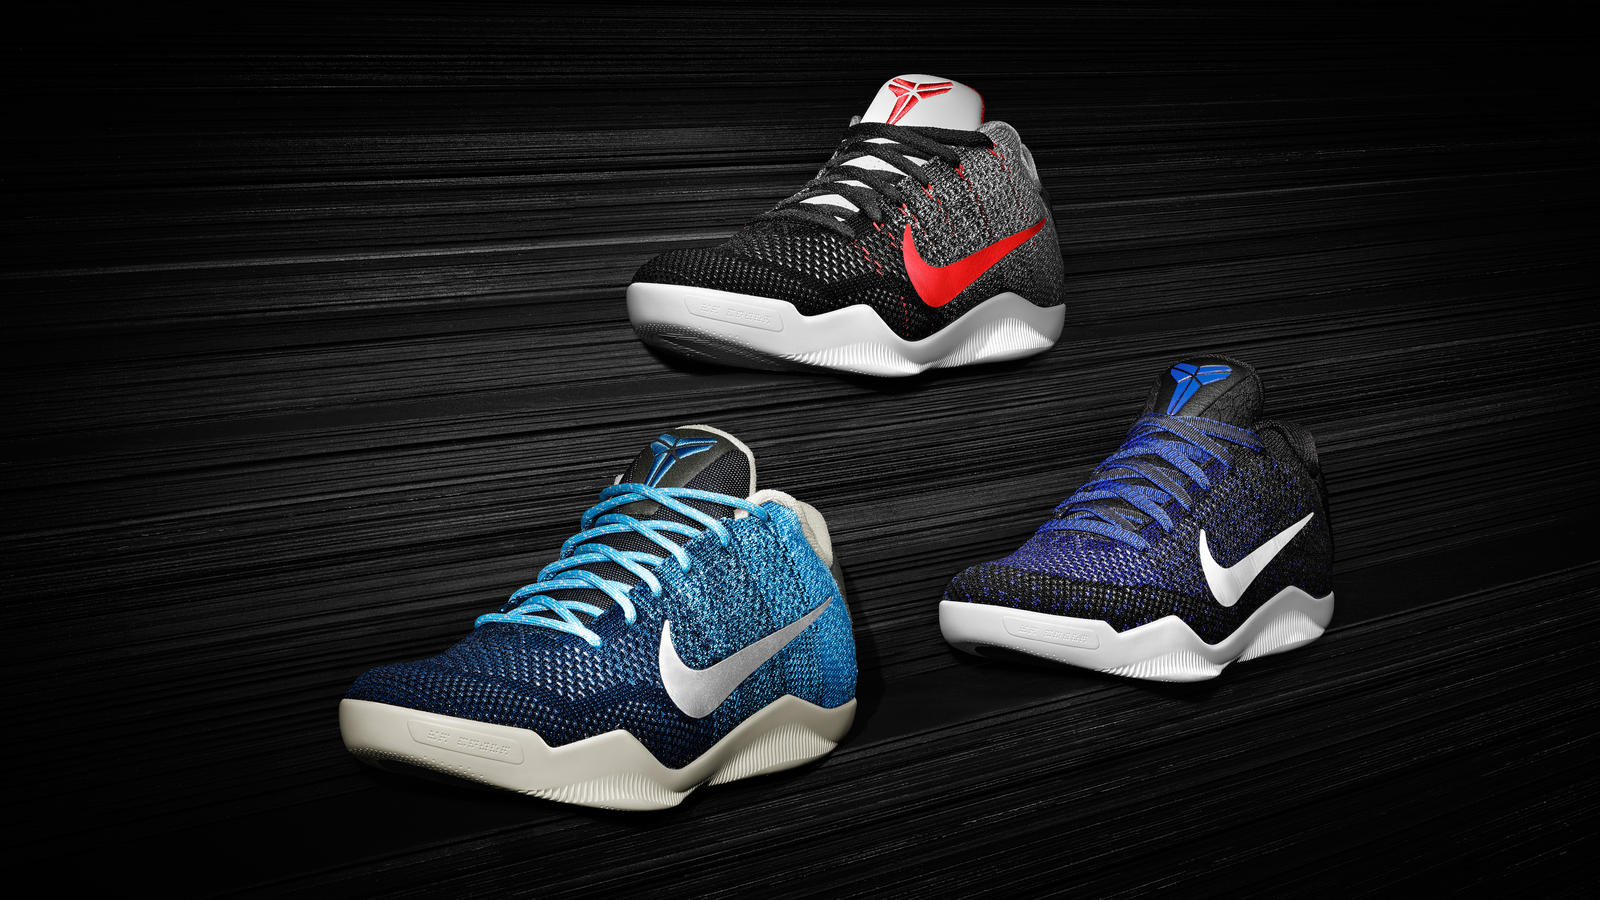 16-130_Nike_Kobe_822675_Group_B-02